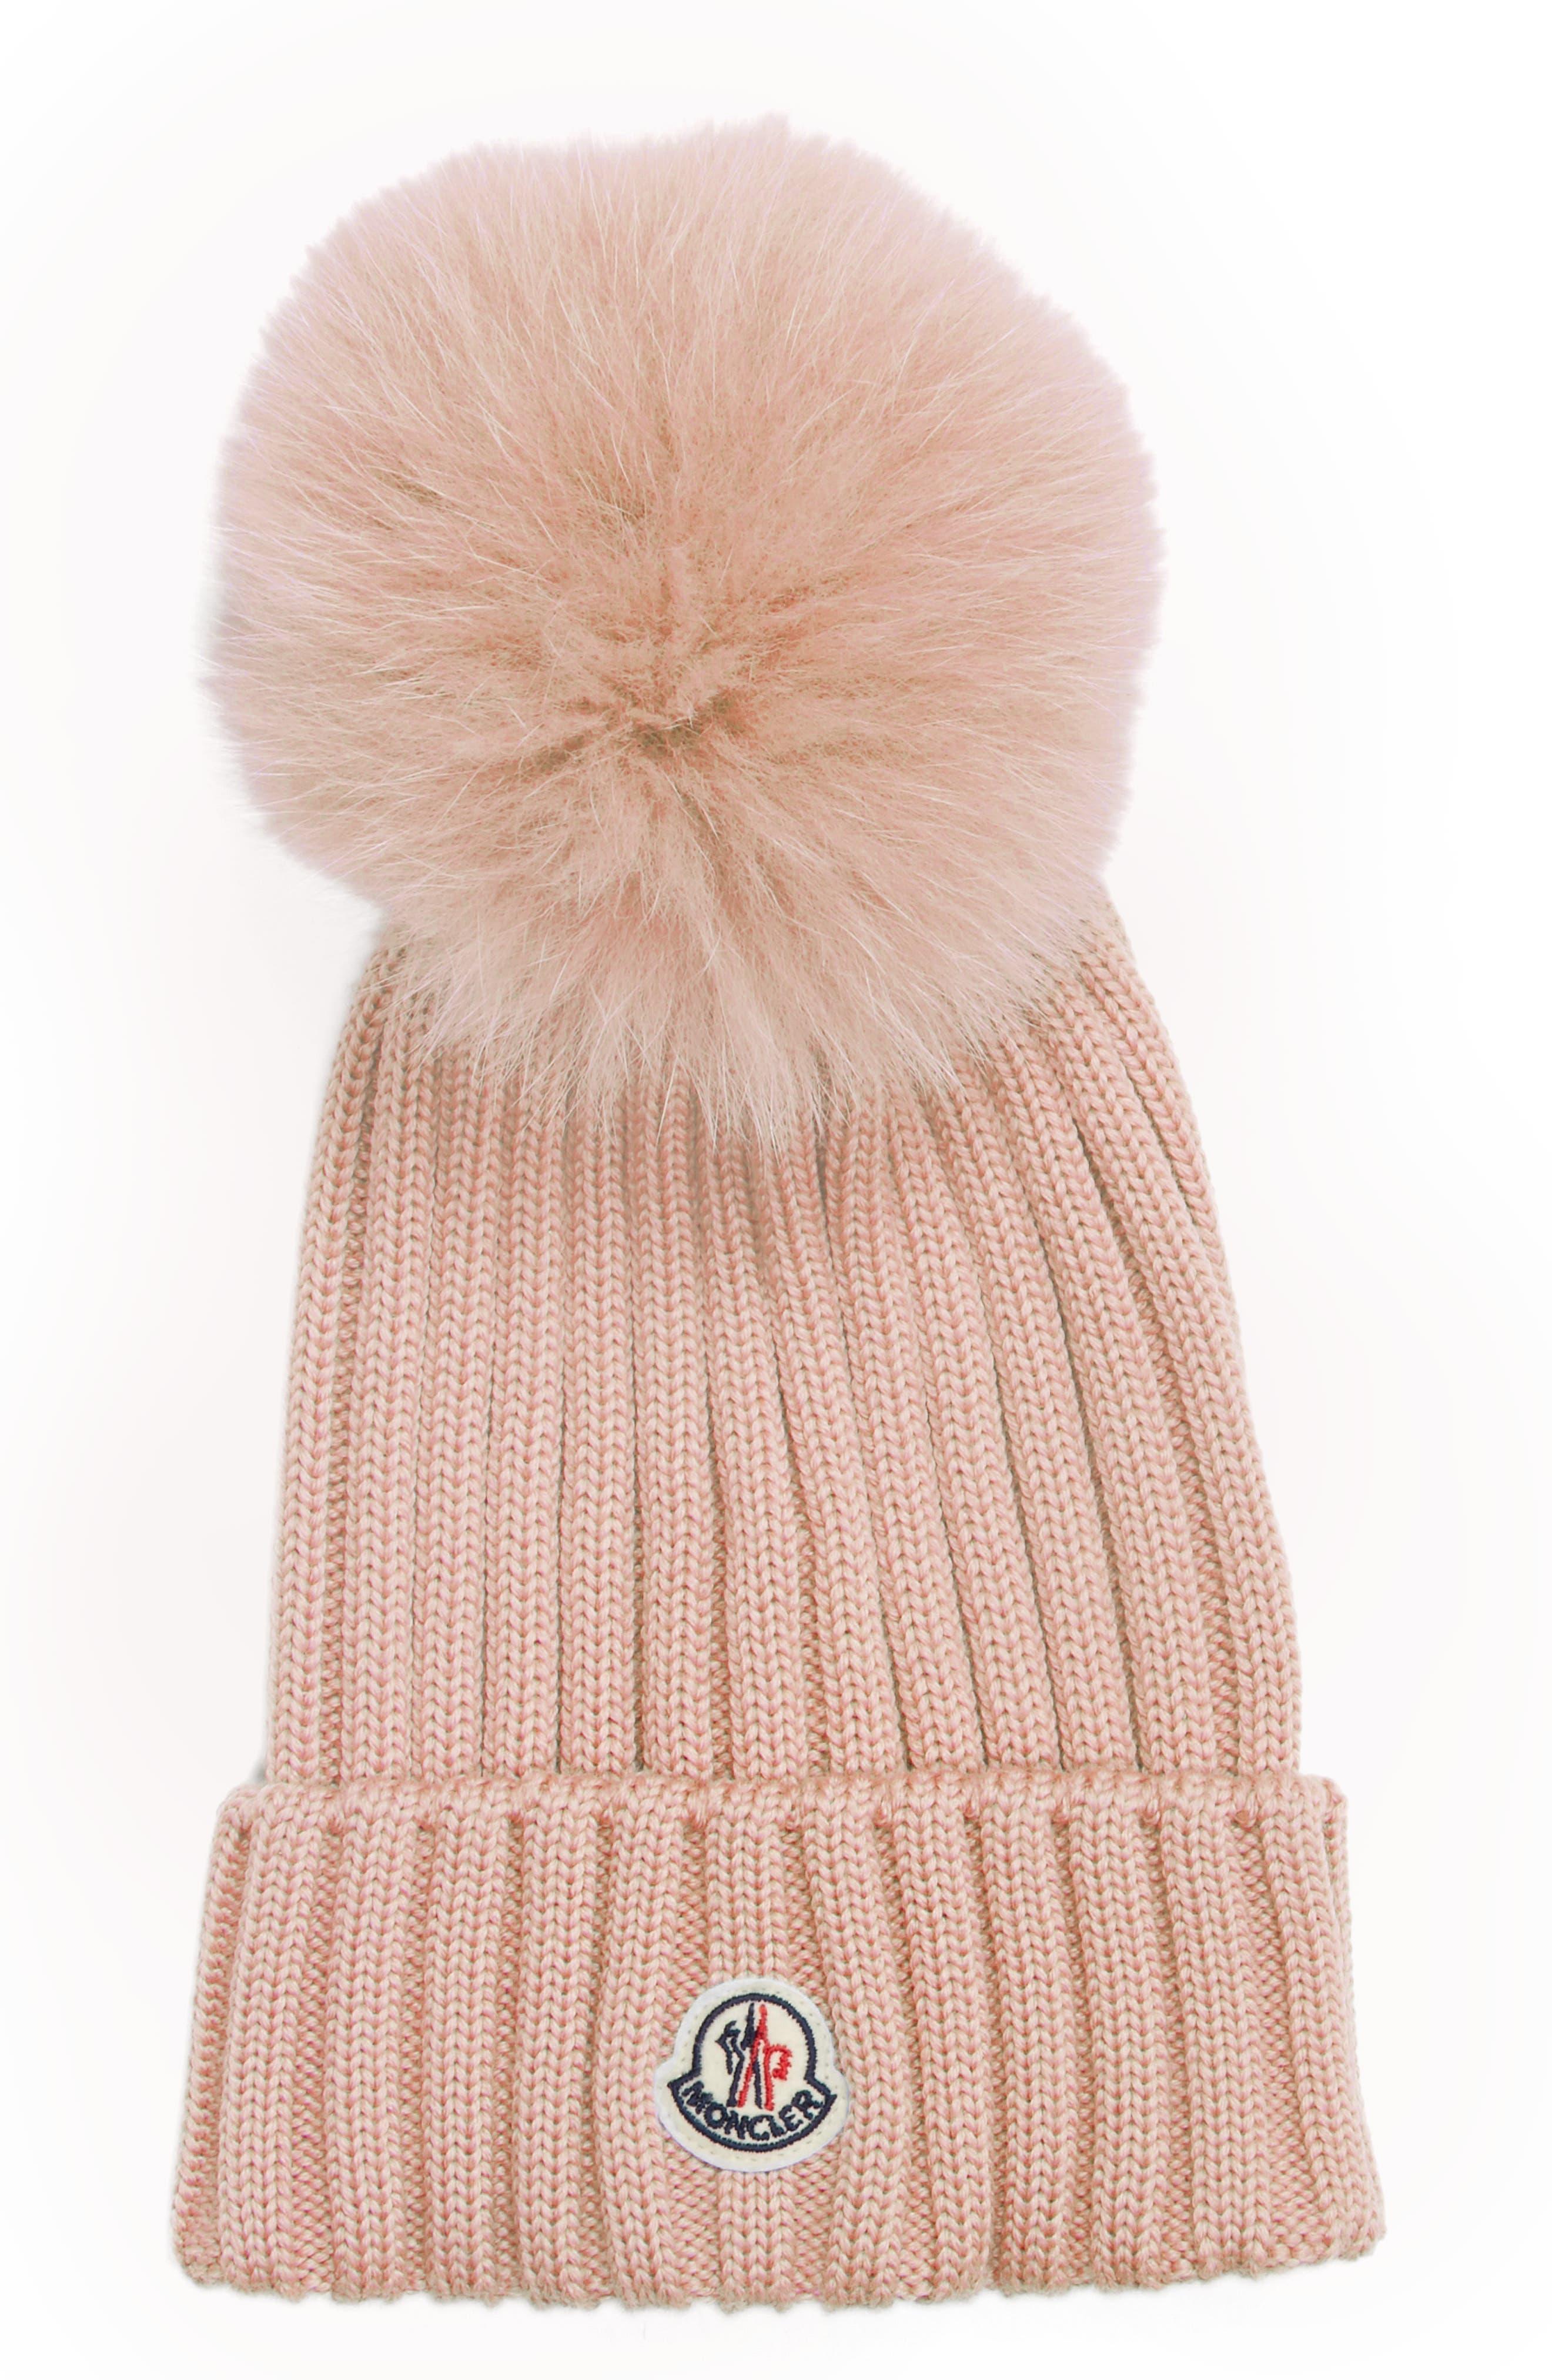 Moncer Genuine Fox Fur Pom Wool Beanie